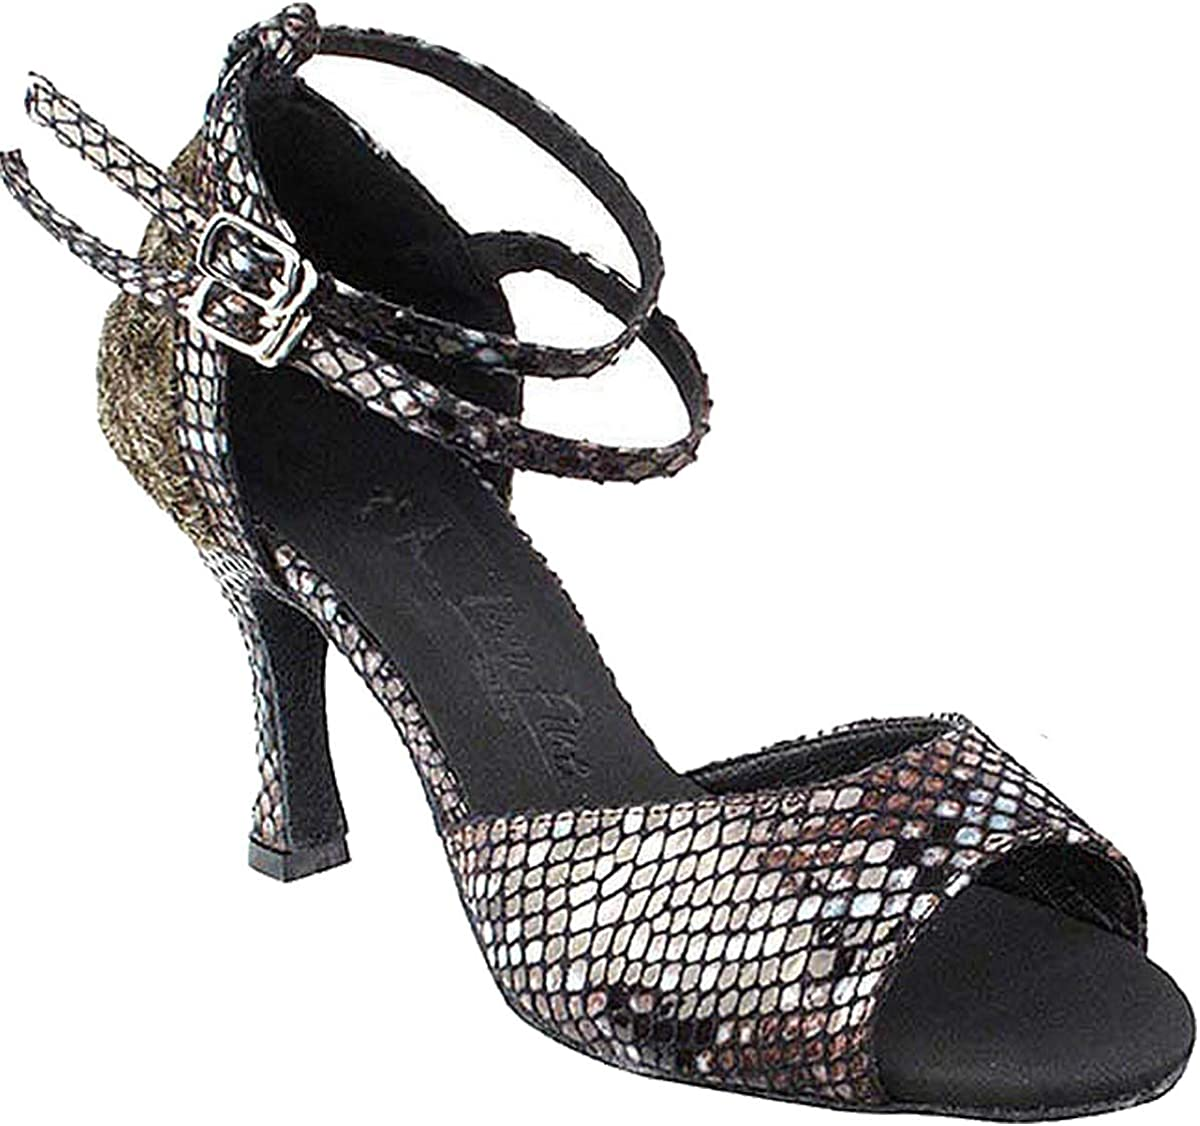 Women's Ballroom Dance Shoes Tango Wedding Salsa Shoes Sera7008EB Comfortable Very Fine 2.5